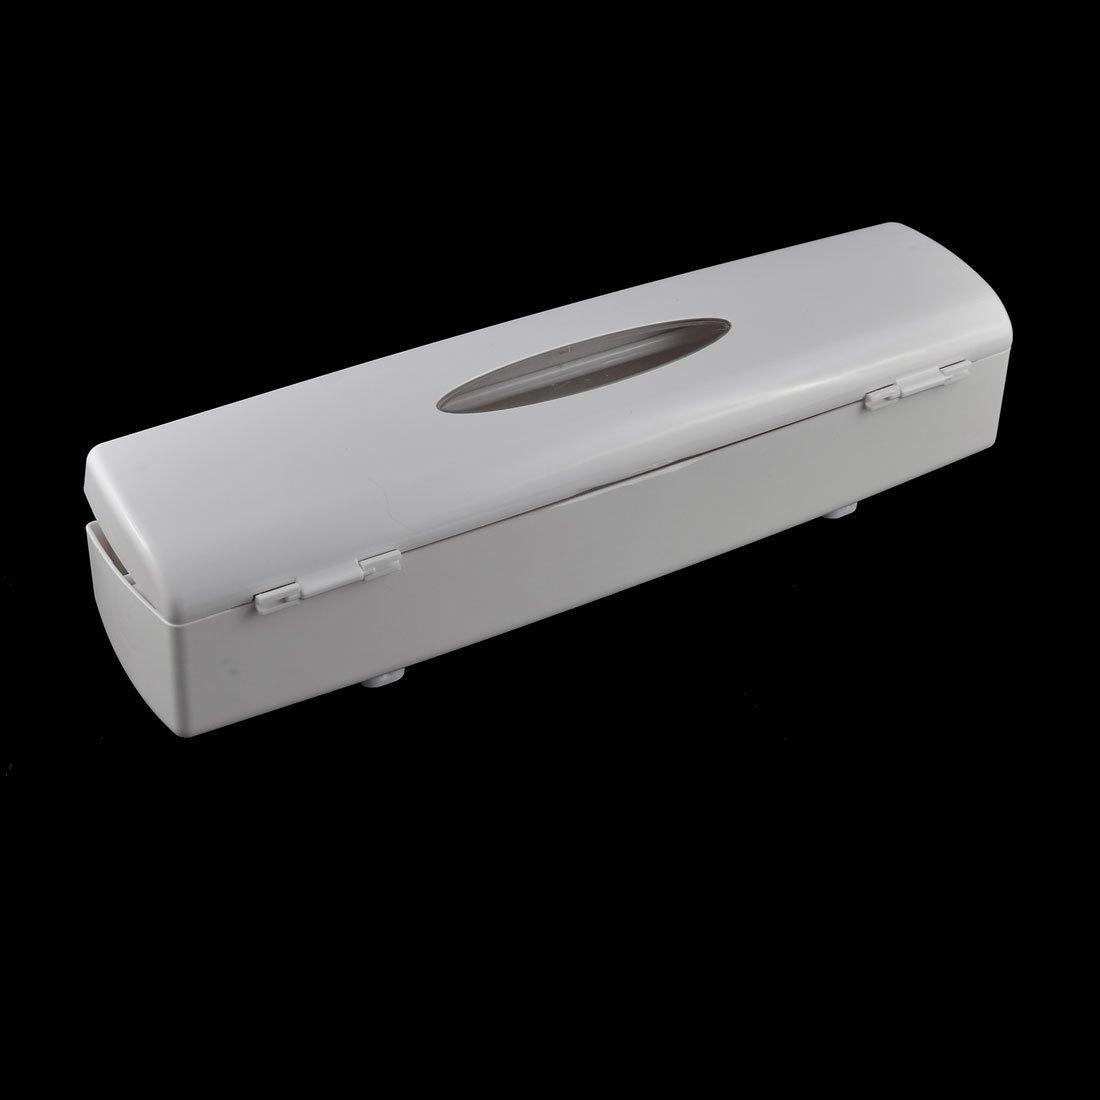 Amazon.com: eDealMax casero cocina Wraptastic Smart Food papel de aluminio Papel de cera blanca dispensador: Kitchen & Dining